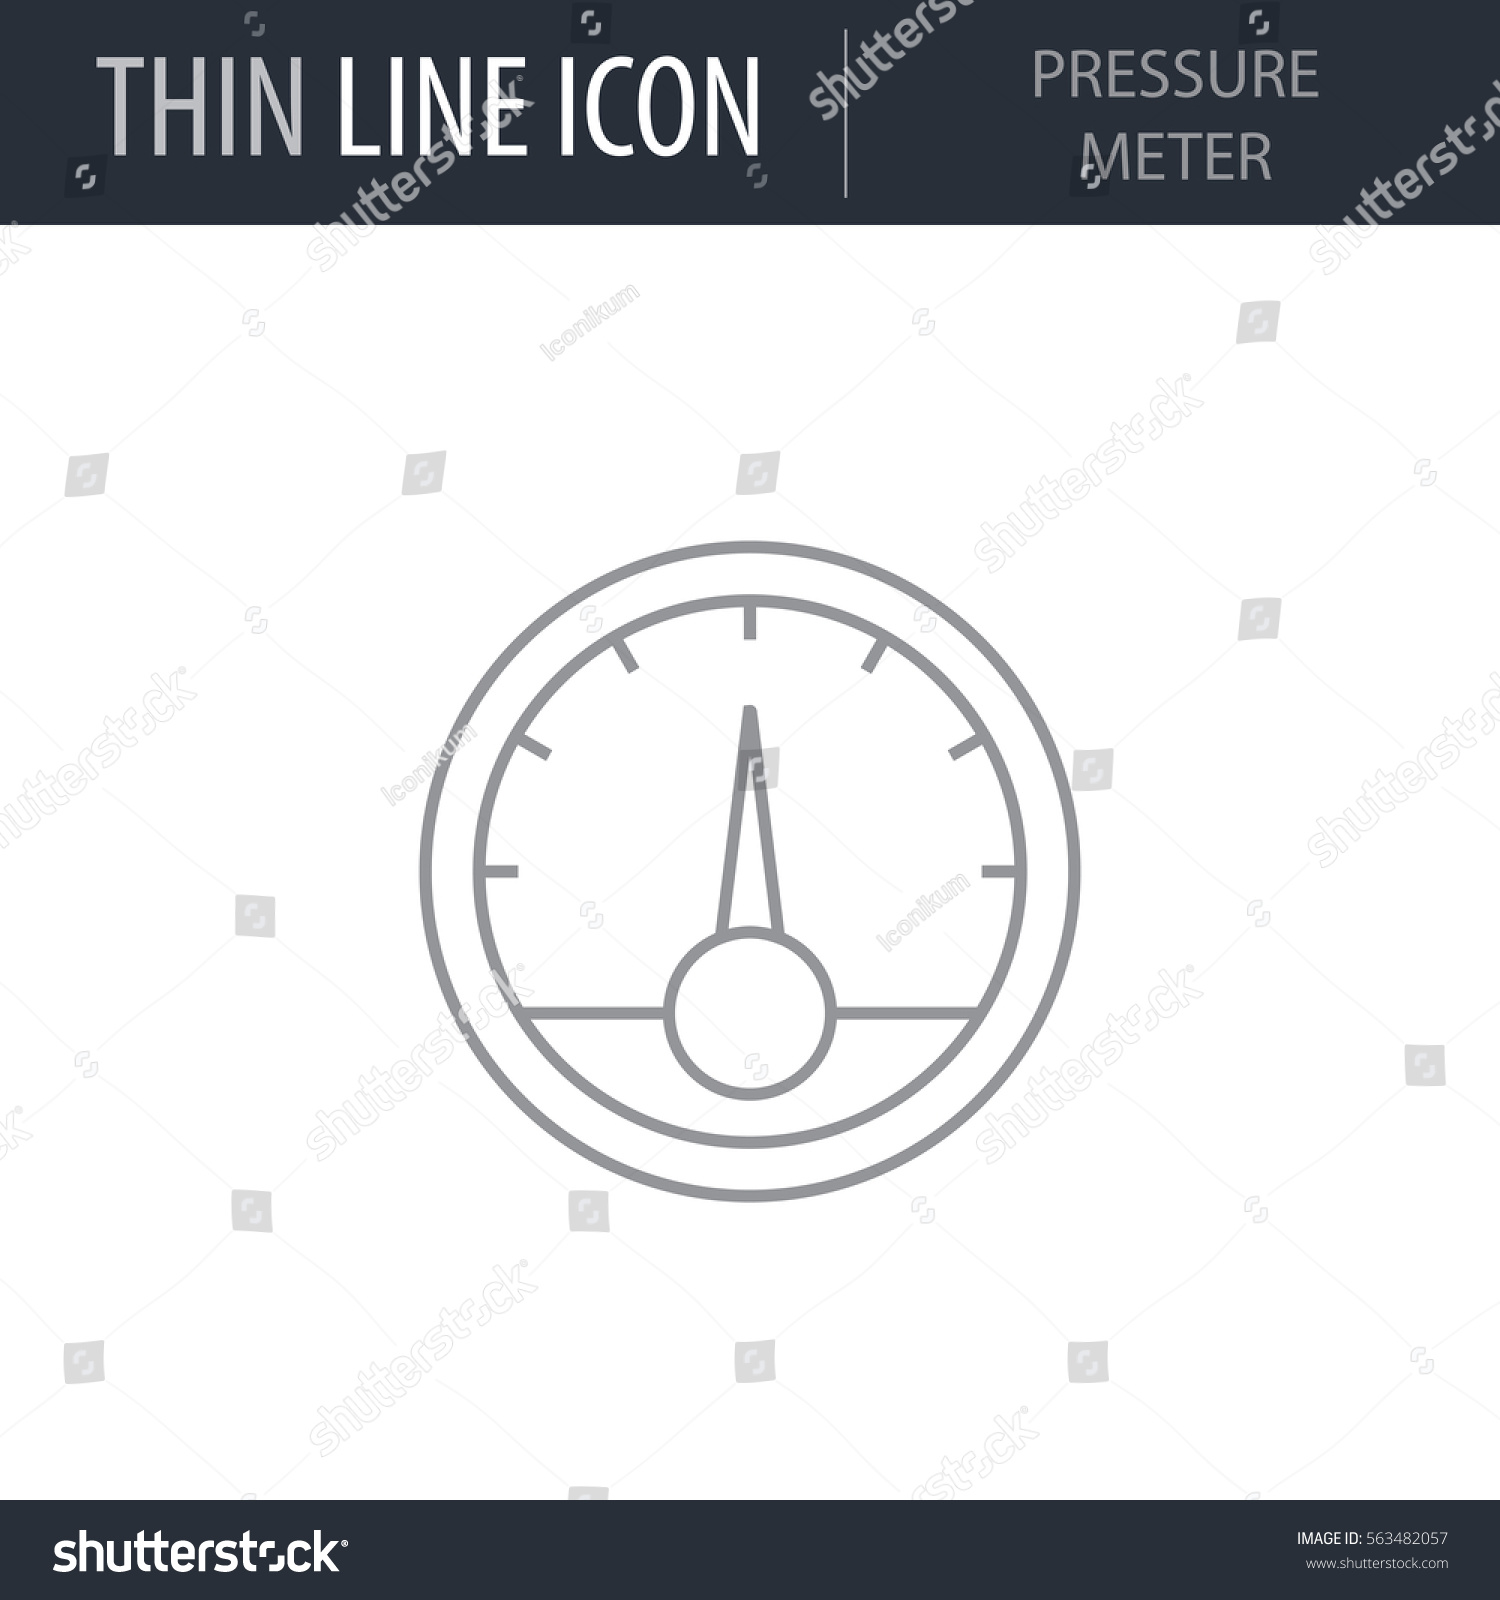 Symbol for meter dolgular symbols beautiful electrical symbols diagram symbol for meter biocorpaavc